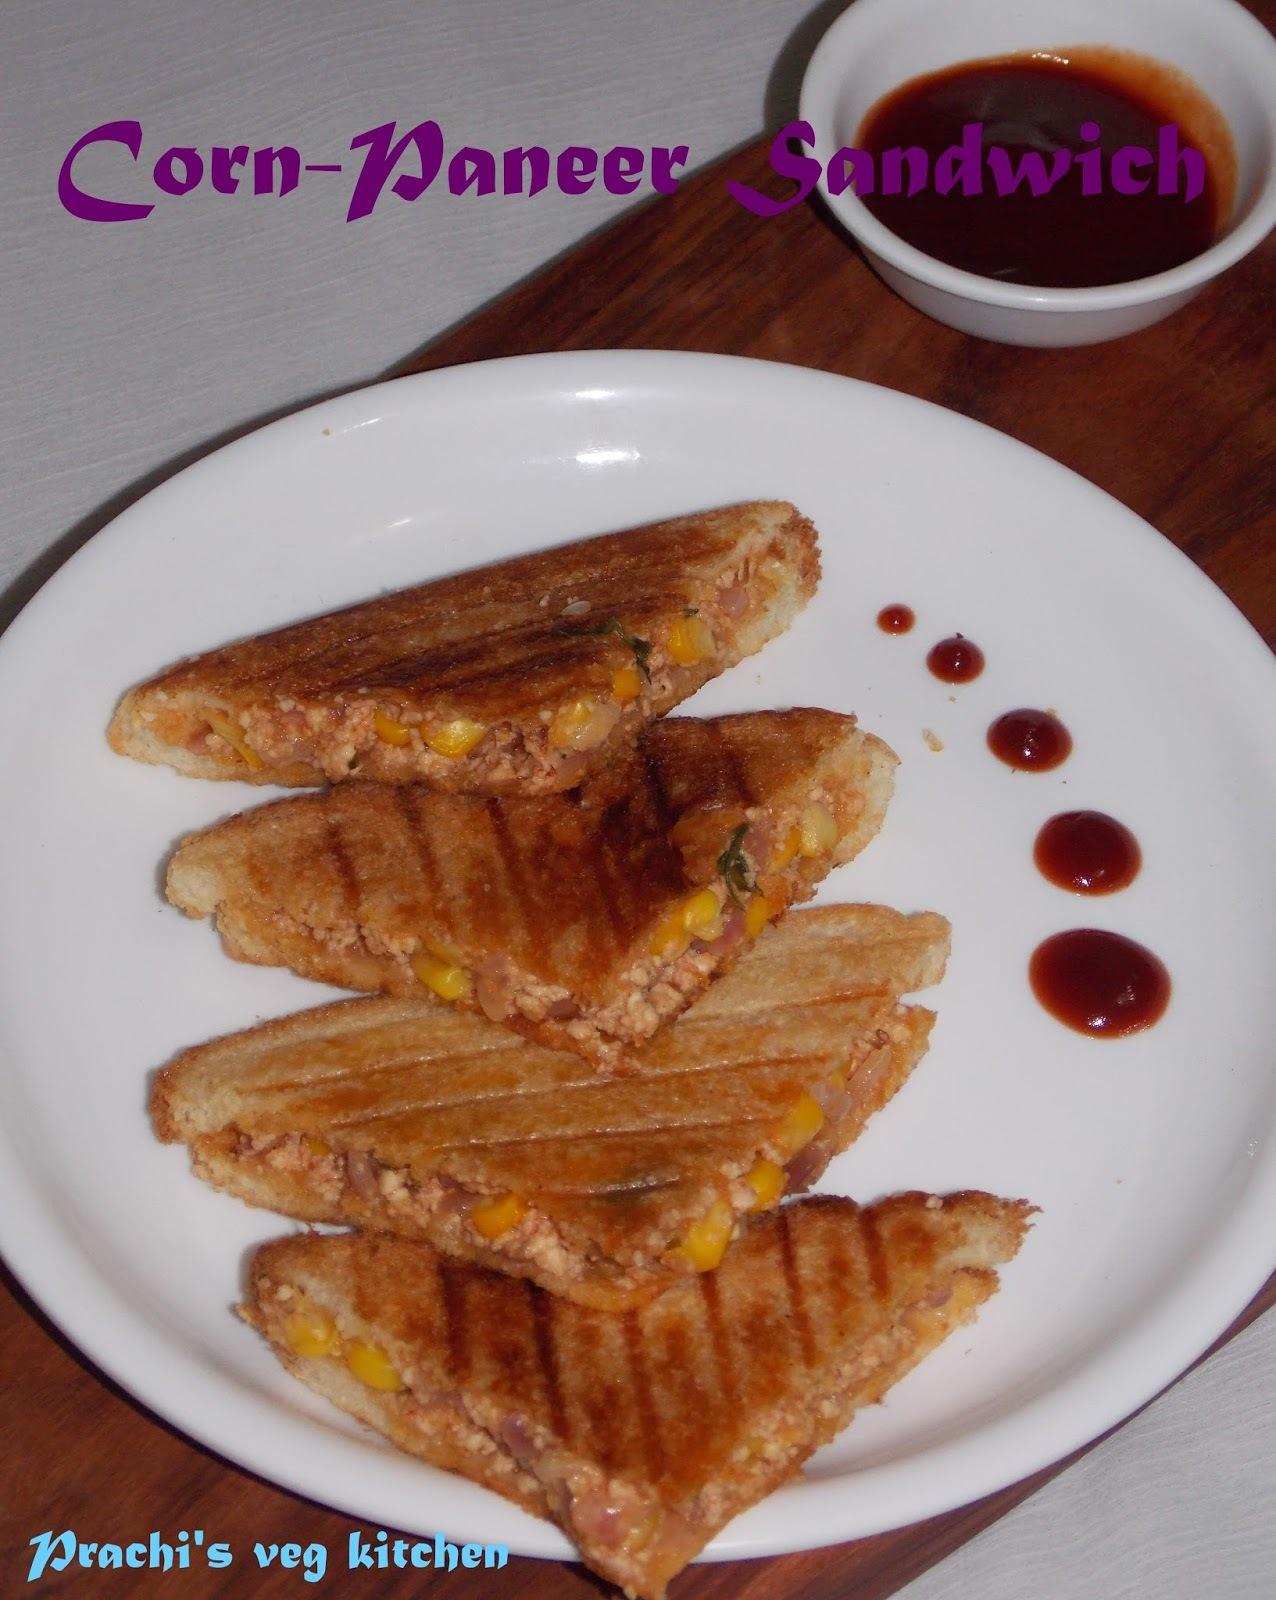 Corn-Paneer Sandwich